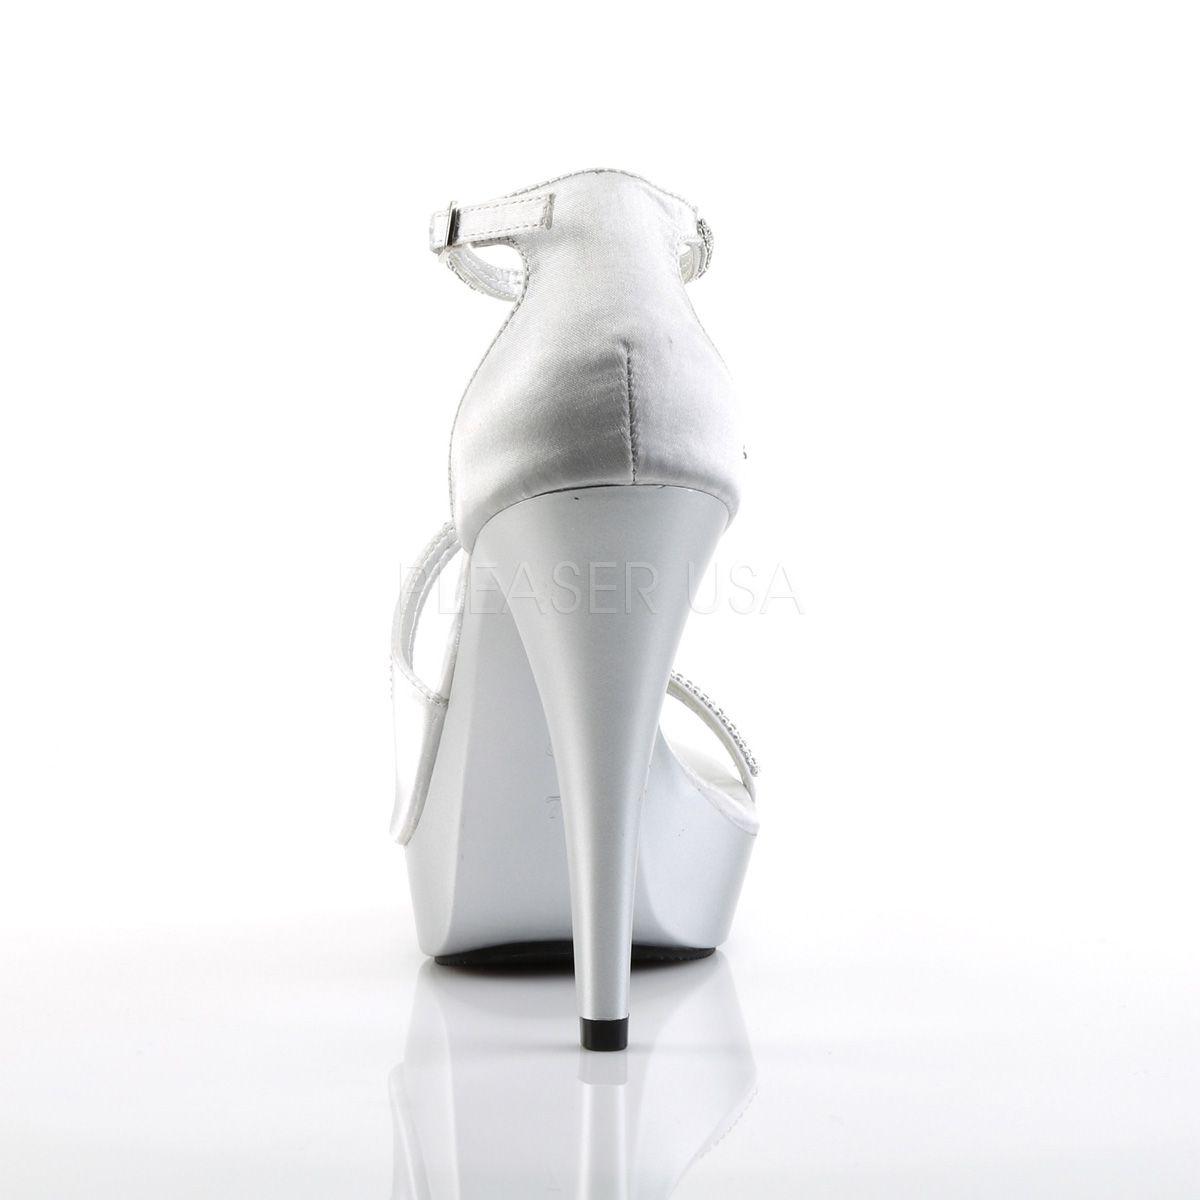 Sandalias sexy de diseño original de Pleaser con strass